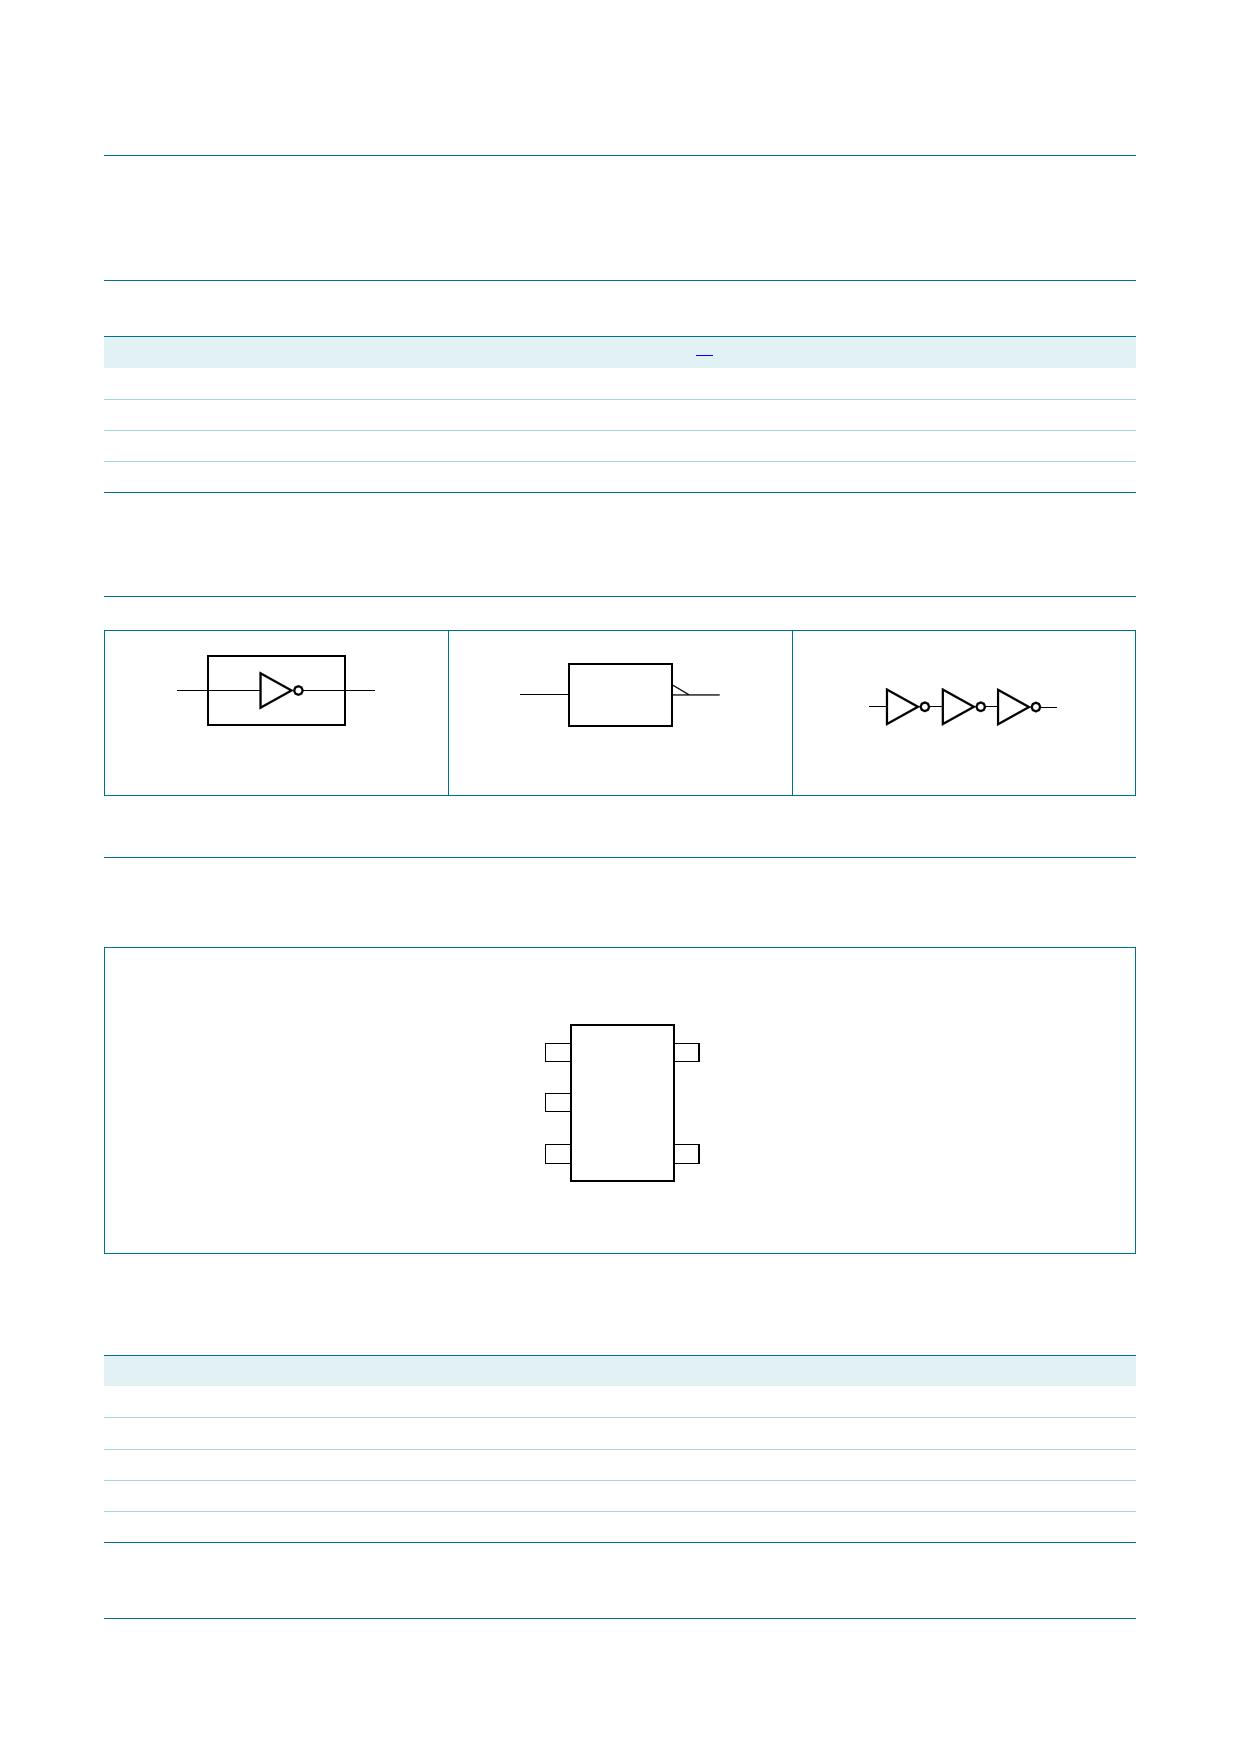 74HC1G04GW pdf, equivalent, schematic